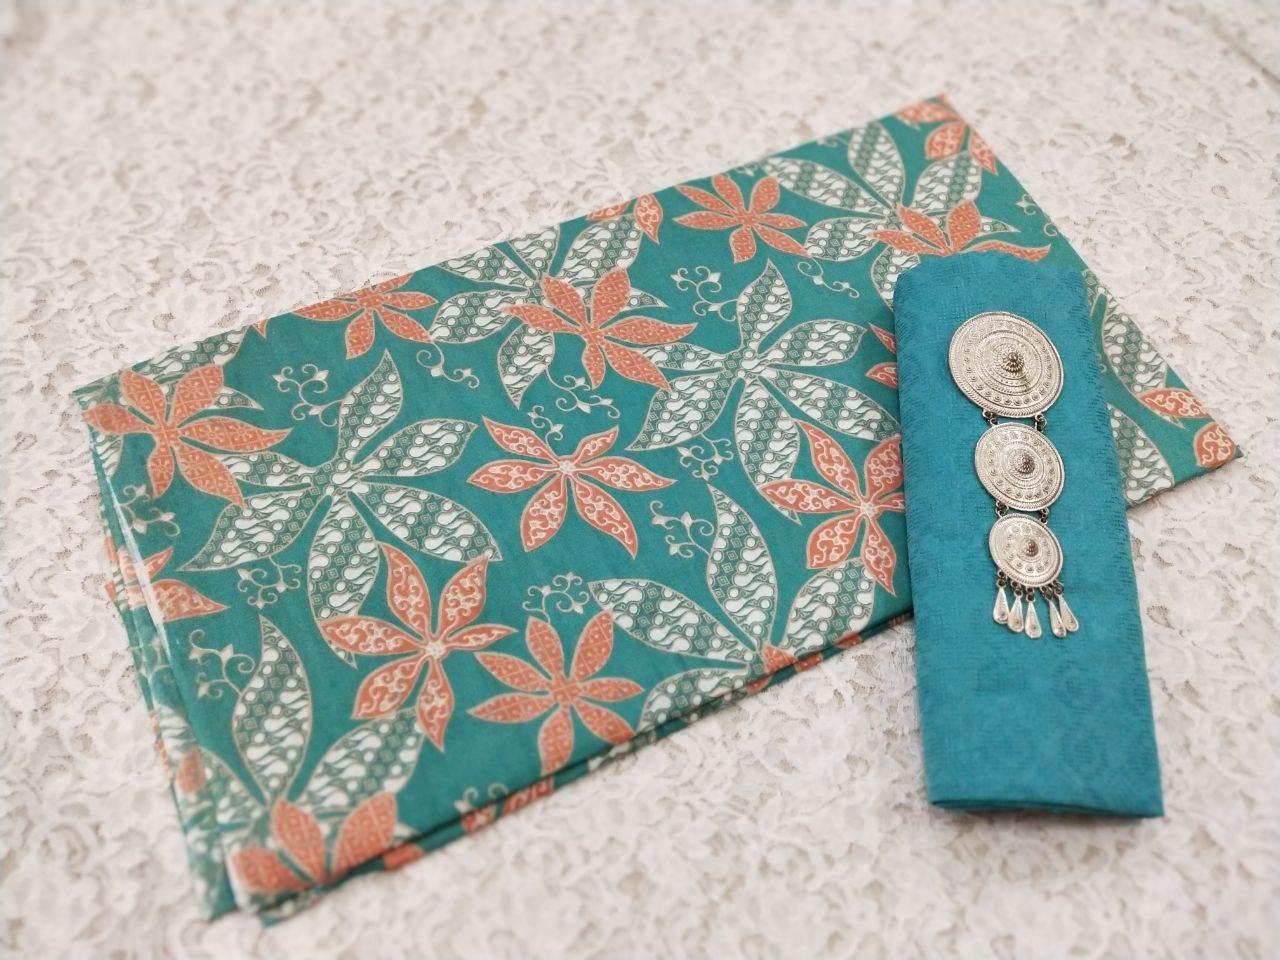 kain batik pekalongan warna hijau tosca bahan katun halus